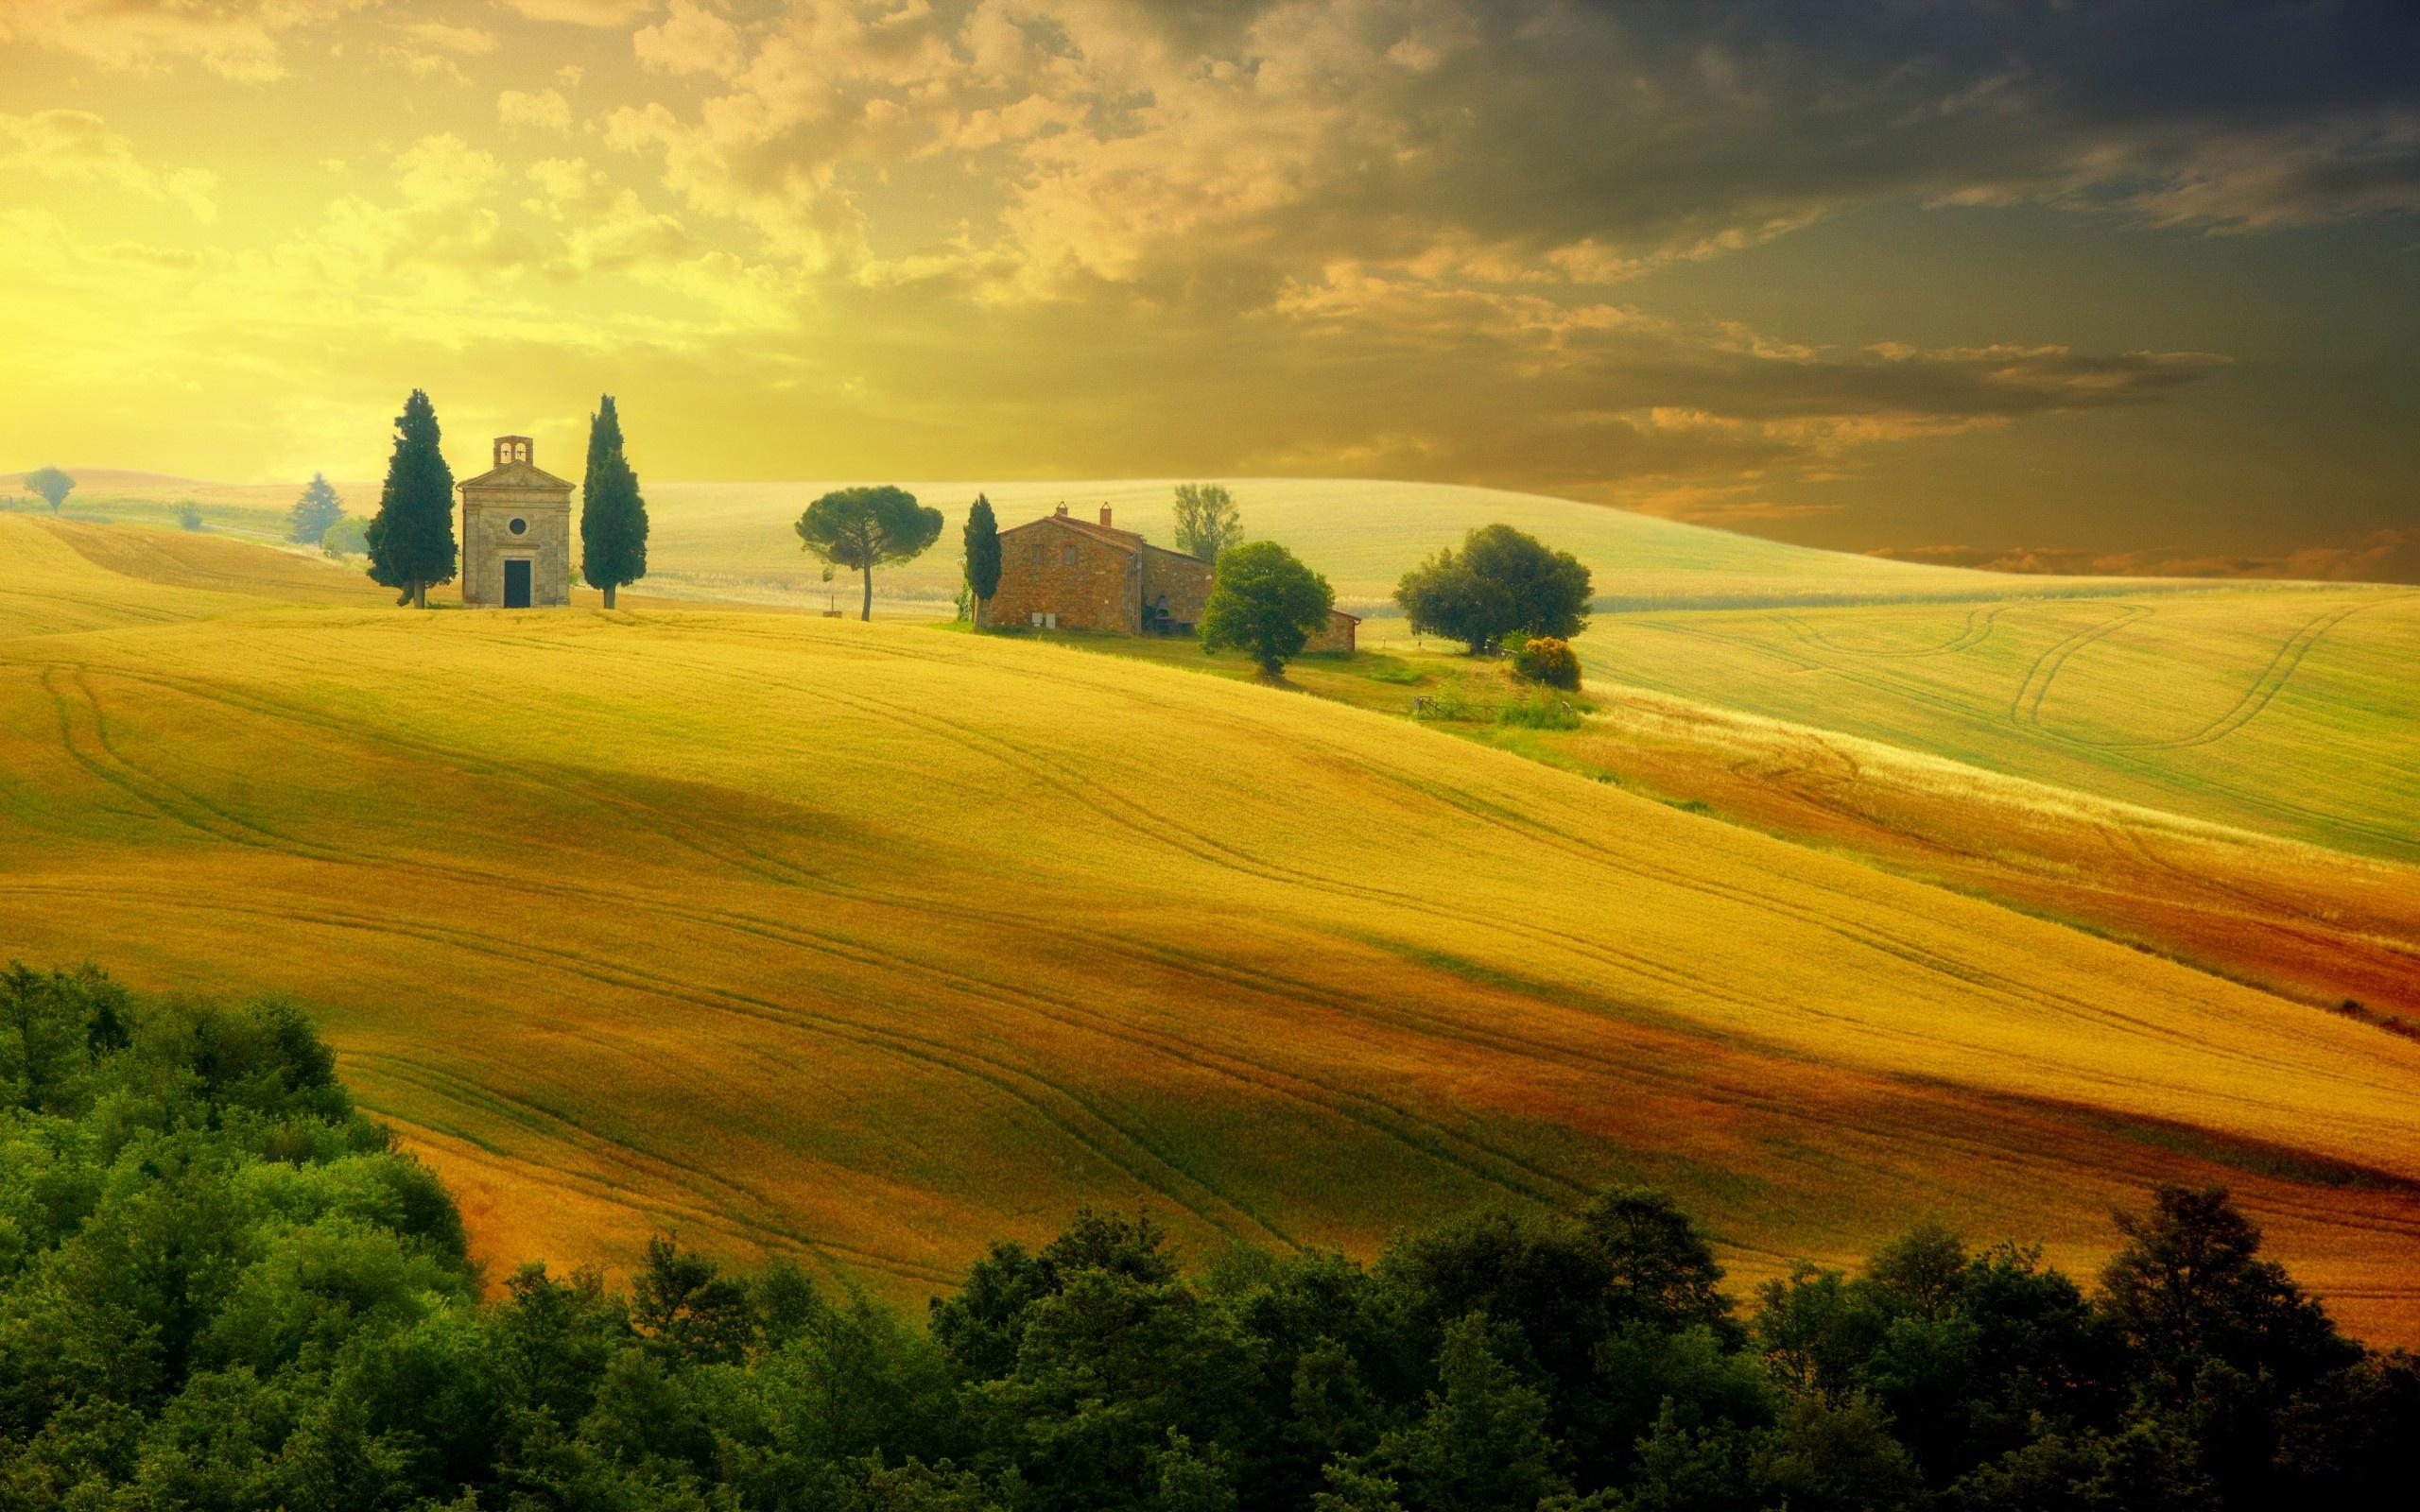 summer sunset landscape wallpaper - photo #47